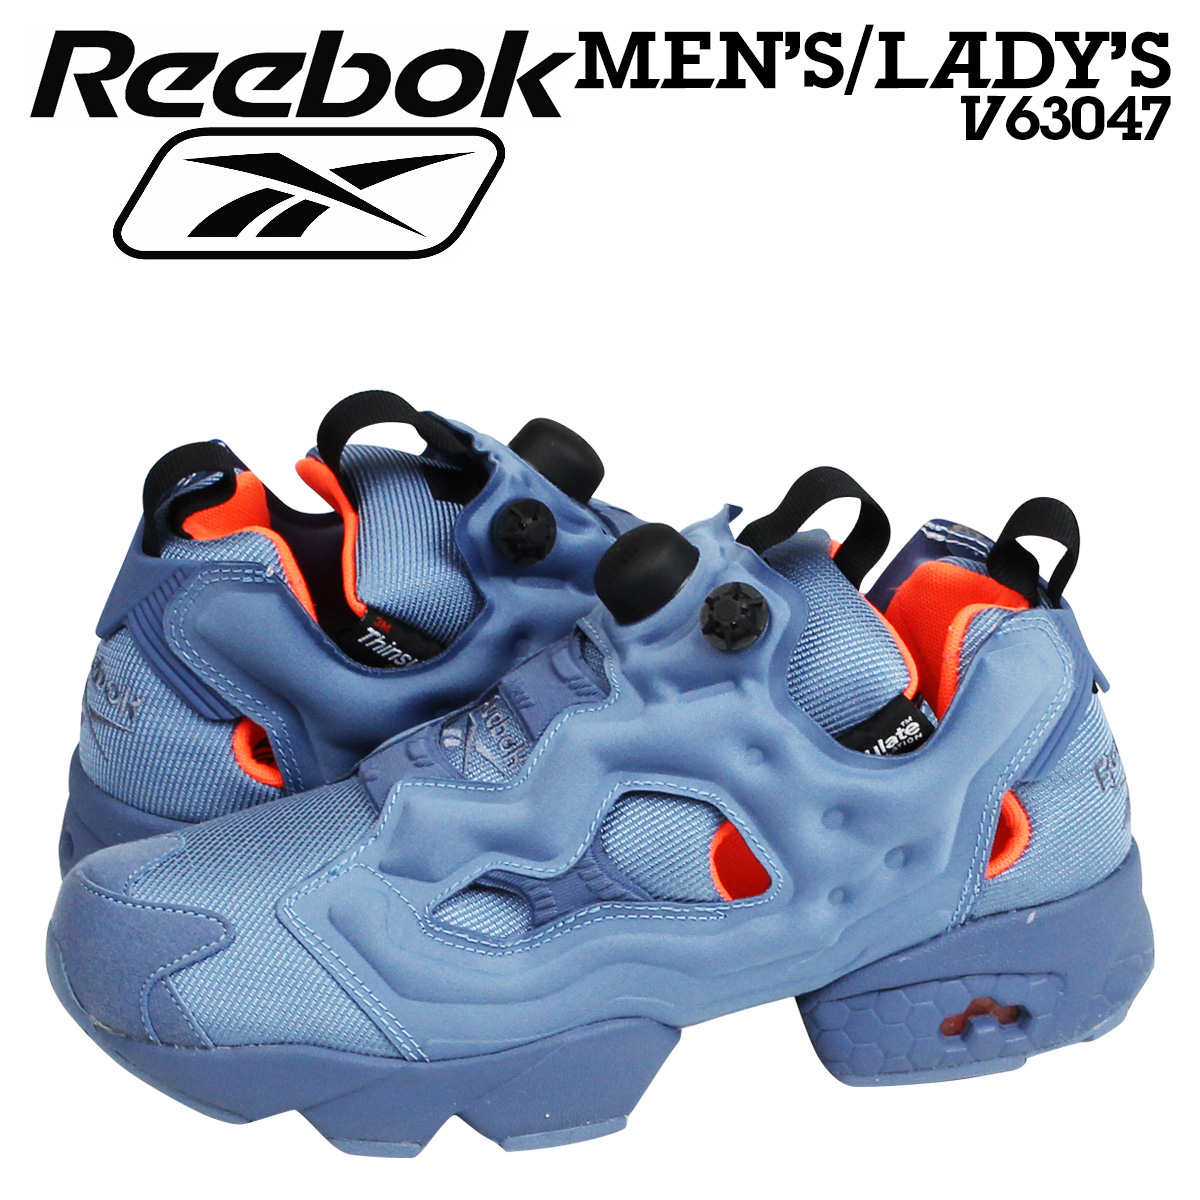 Whats up Sports  Reebok Reebok insta pump fury sneakers INSTAPUMP ... a0223bdca